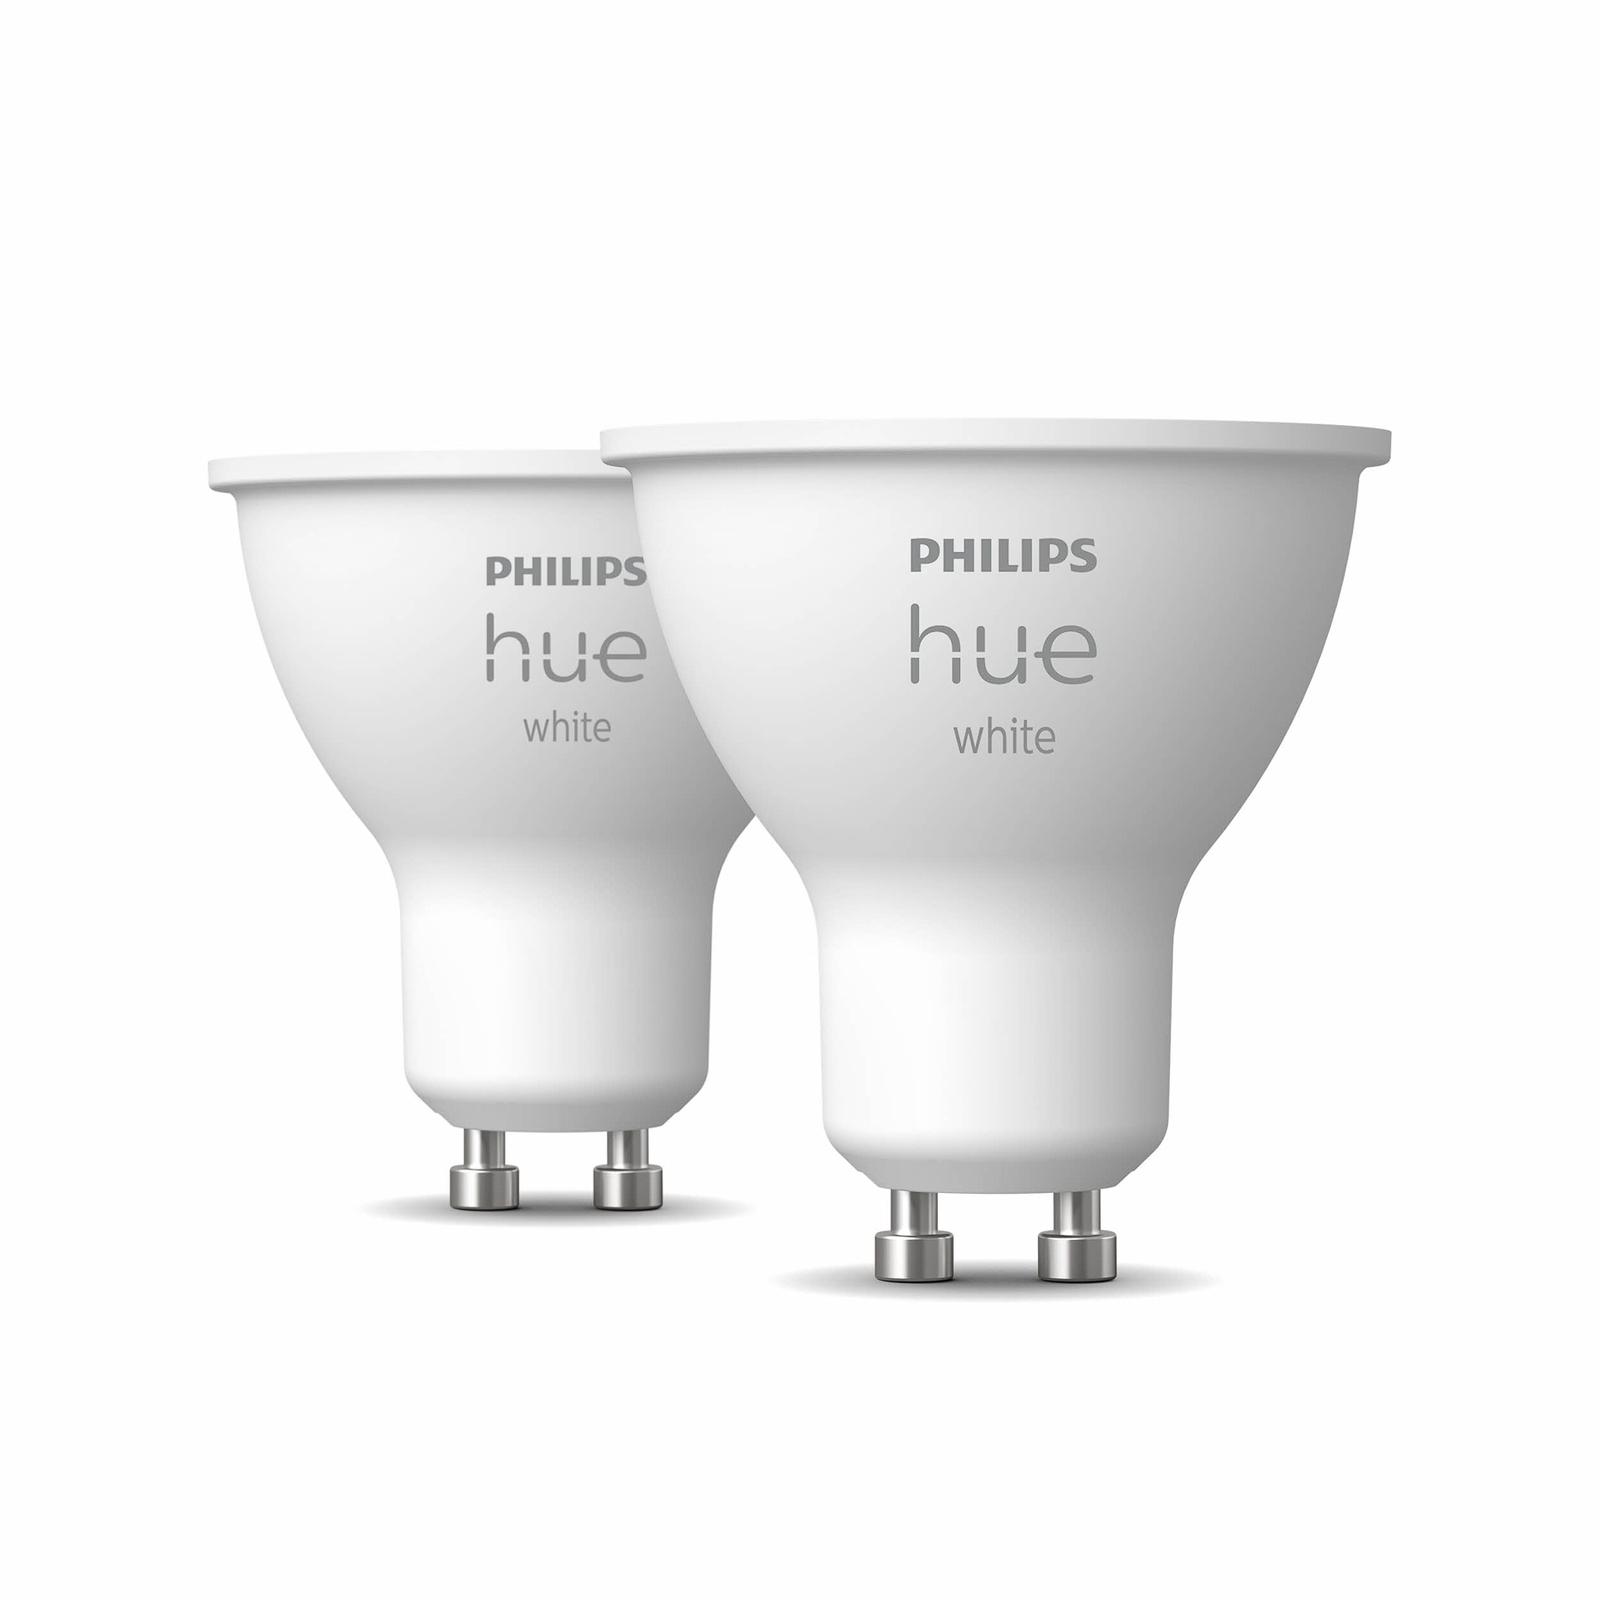 Philips Hue White 5,2 W GU10 LED-lampa, 2-pack